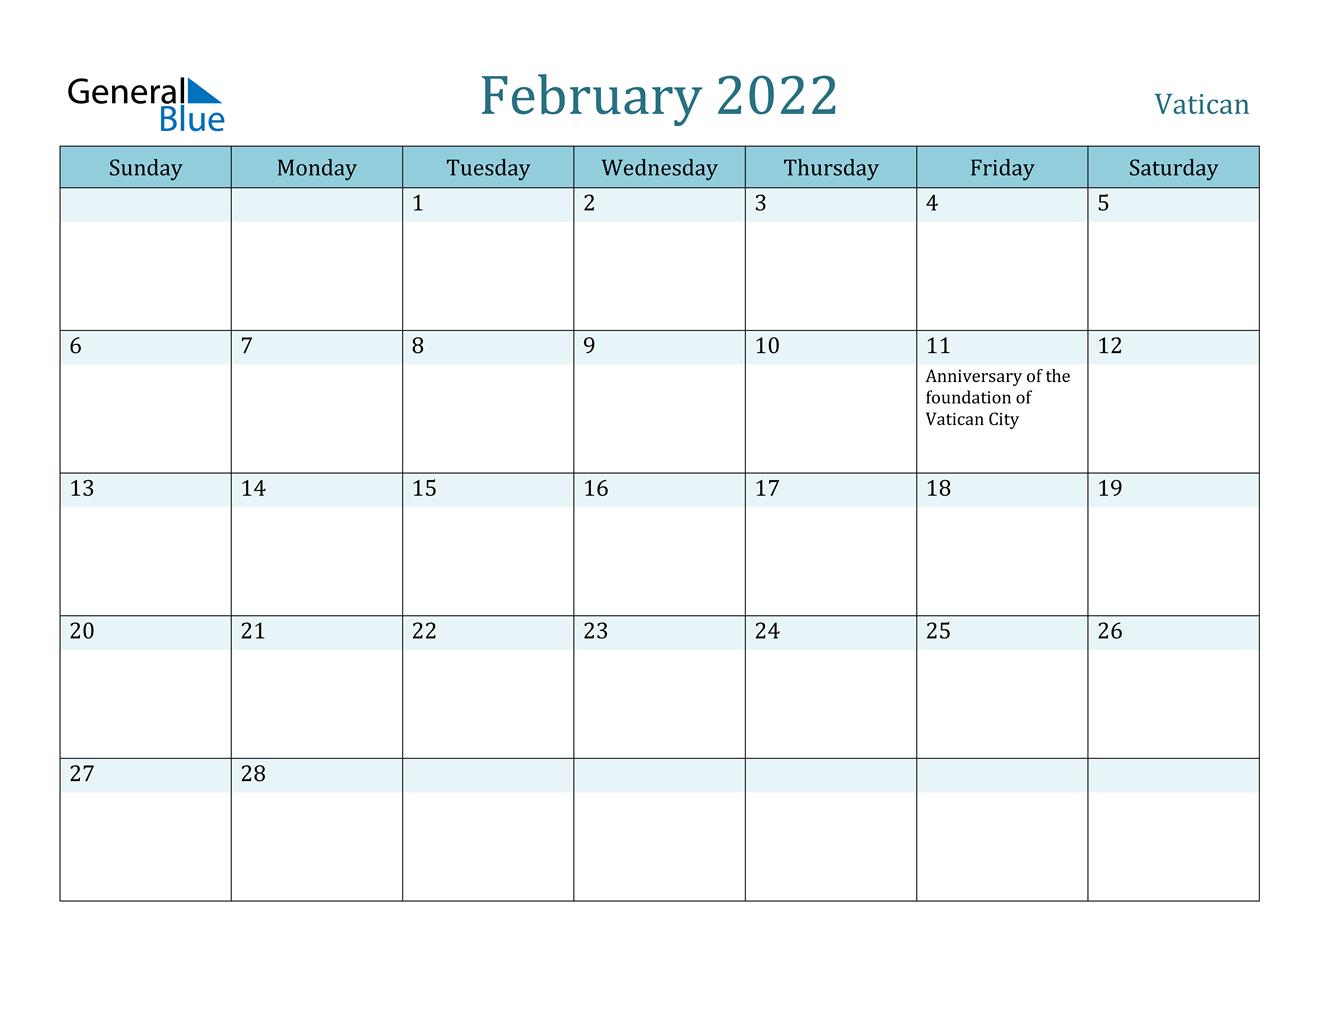 February 2022 Calendar - Vatican Throughout February 2022 Calendar Template